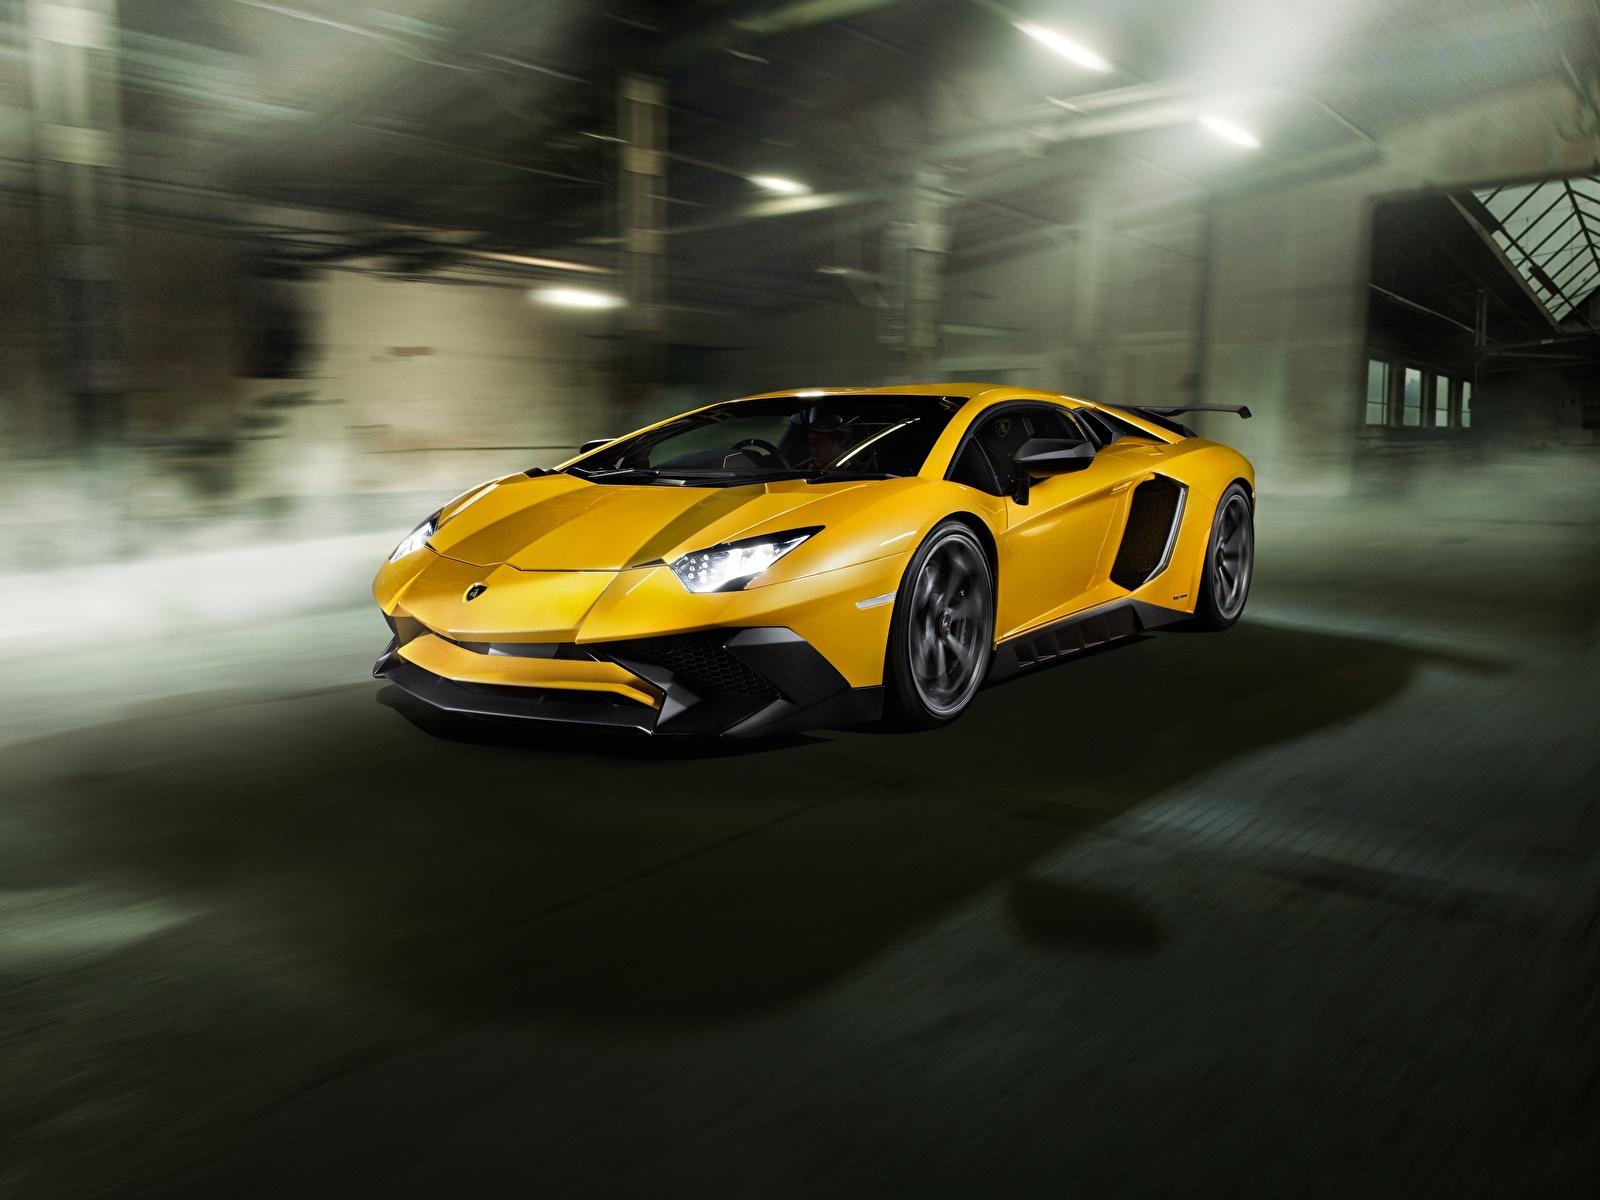 Fotos Lamborghini Aventador Novitec Torado LP 750-4 Gelb Autos 1600x1200 auto automobil